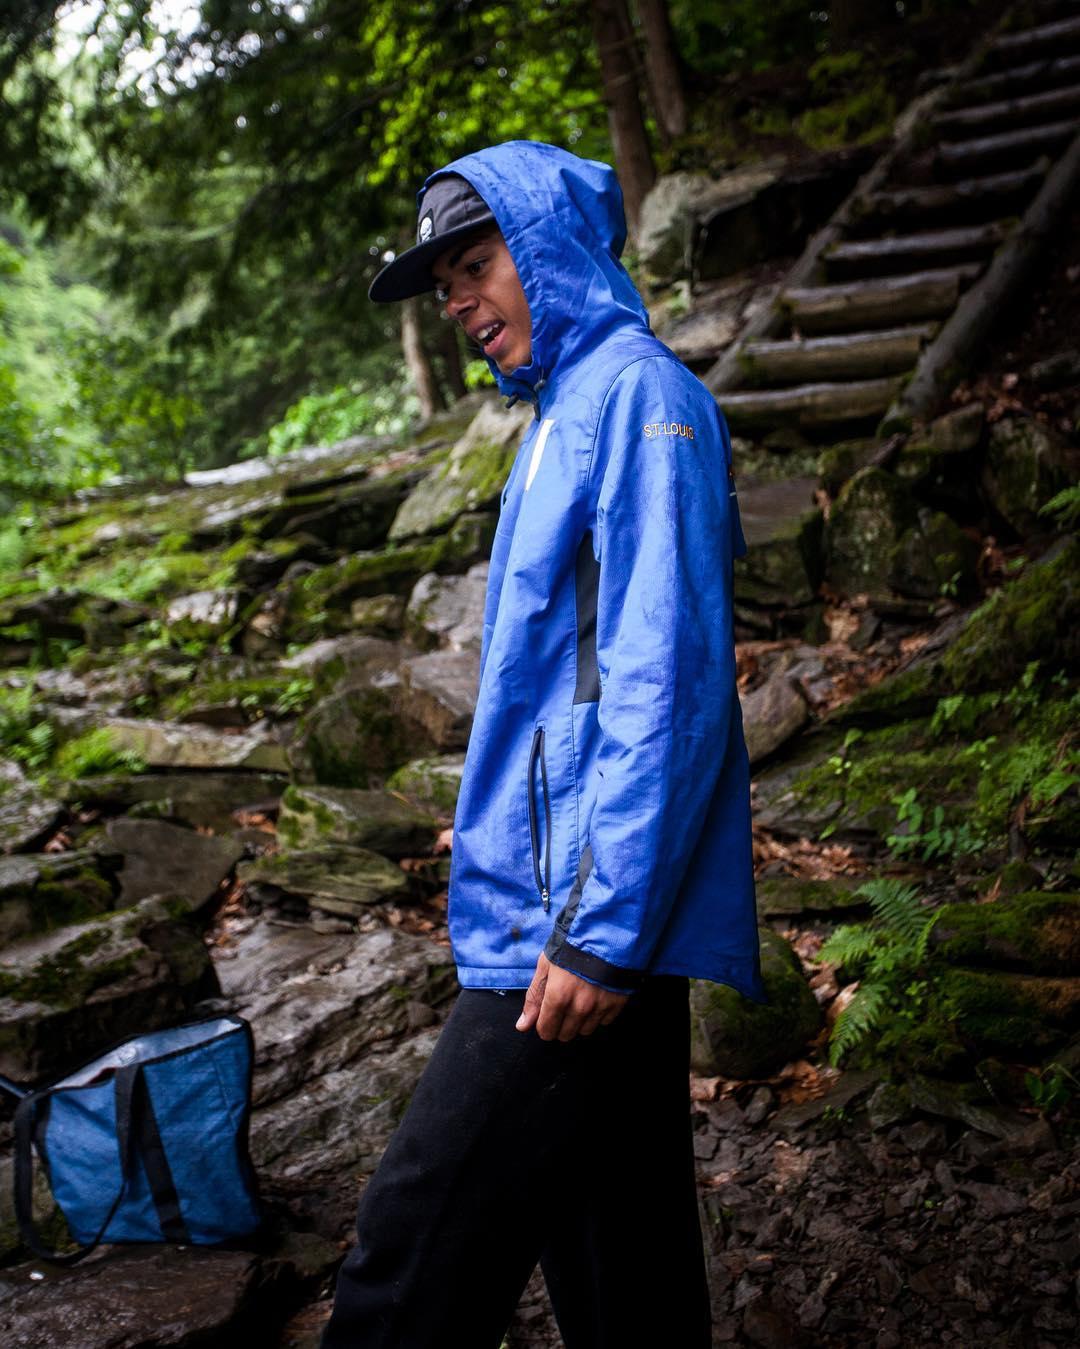 Fortune favors the optimist: #Flowfold ambassador @james.lynch and @yenderthebender30 take the rain in stride.